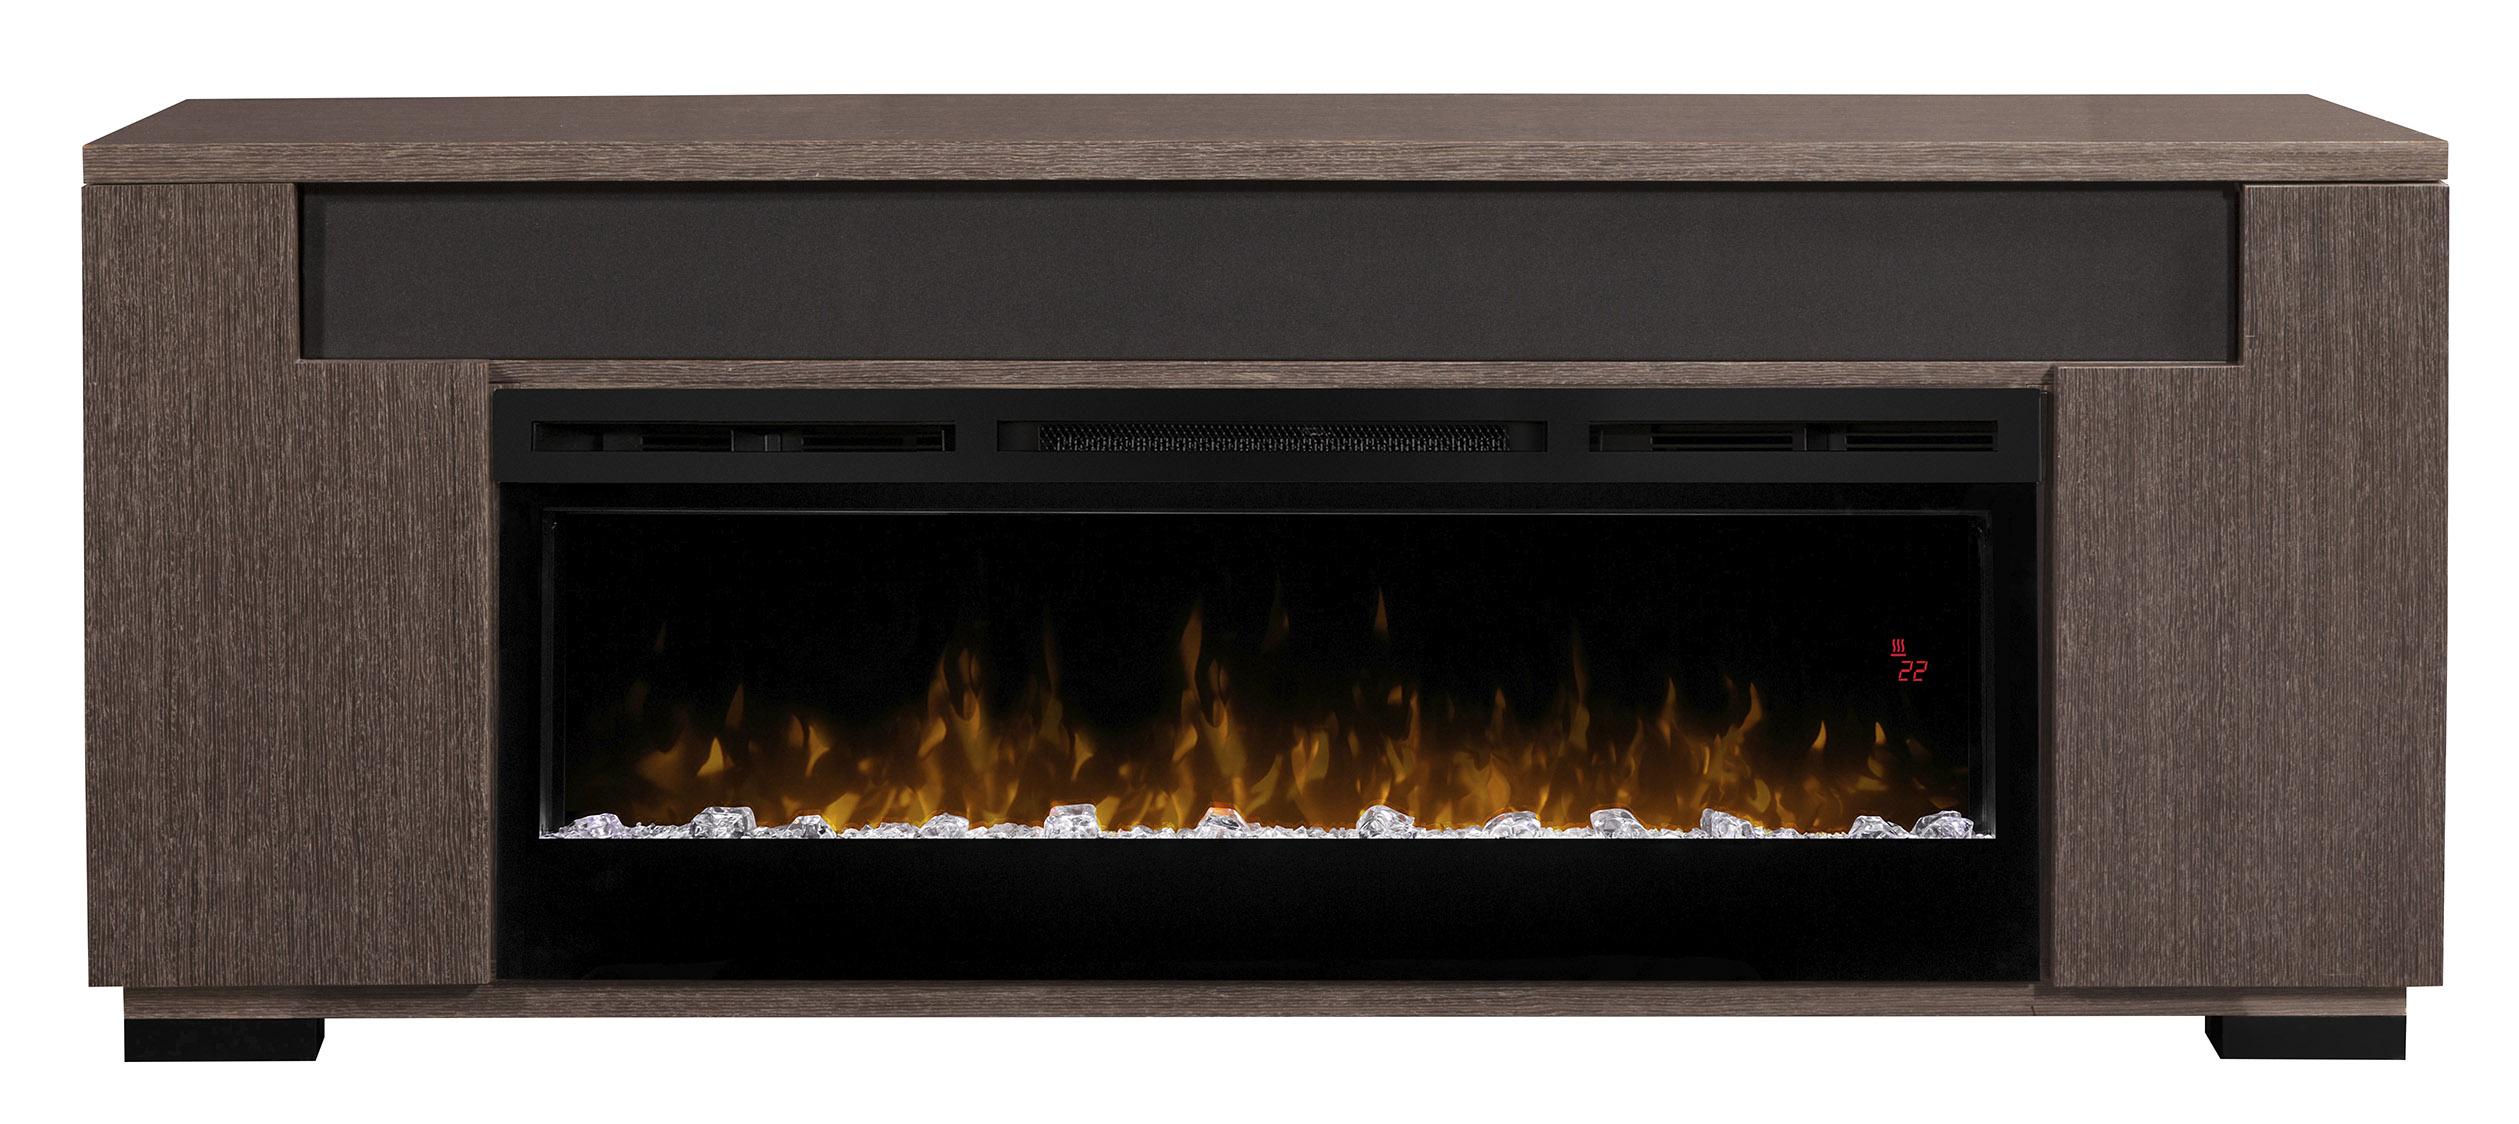 Dimplex Haley Media Console Electric Fireplace Gds50g5 1671w